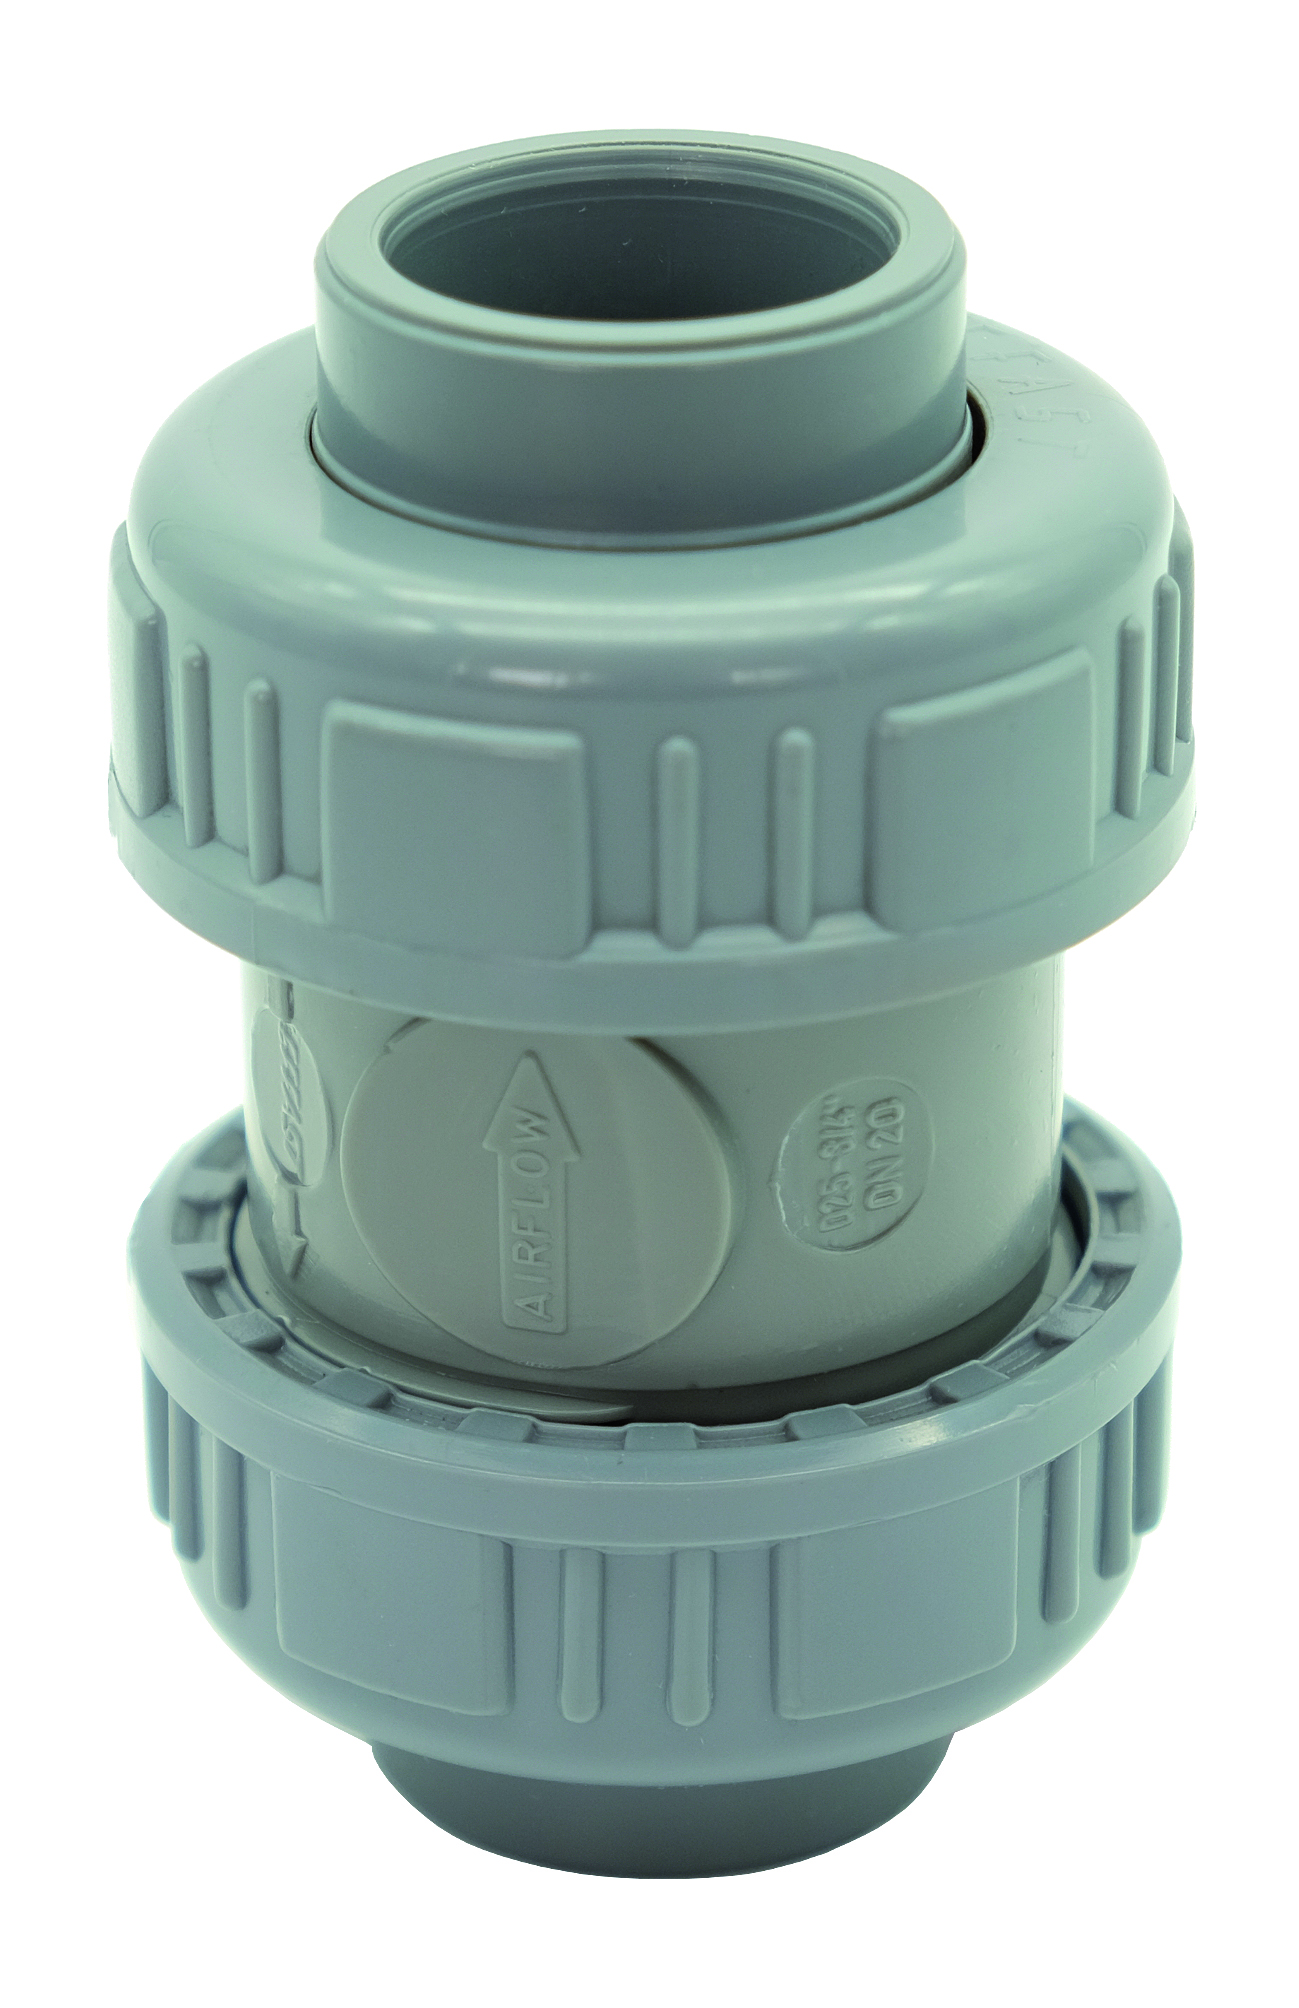 ABS valvola di sfogo aria AV - EFFAST - 100% Made in Italy